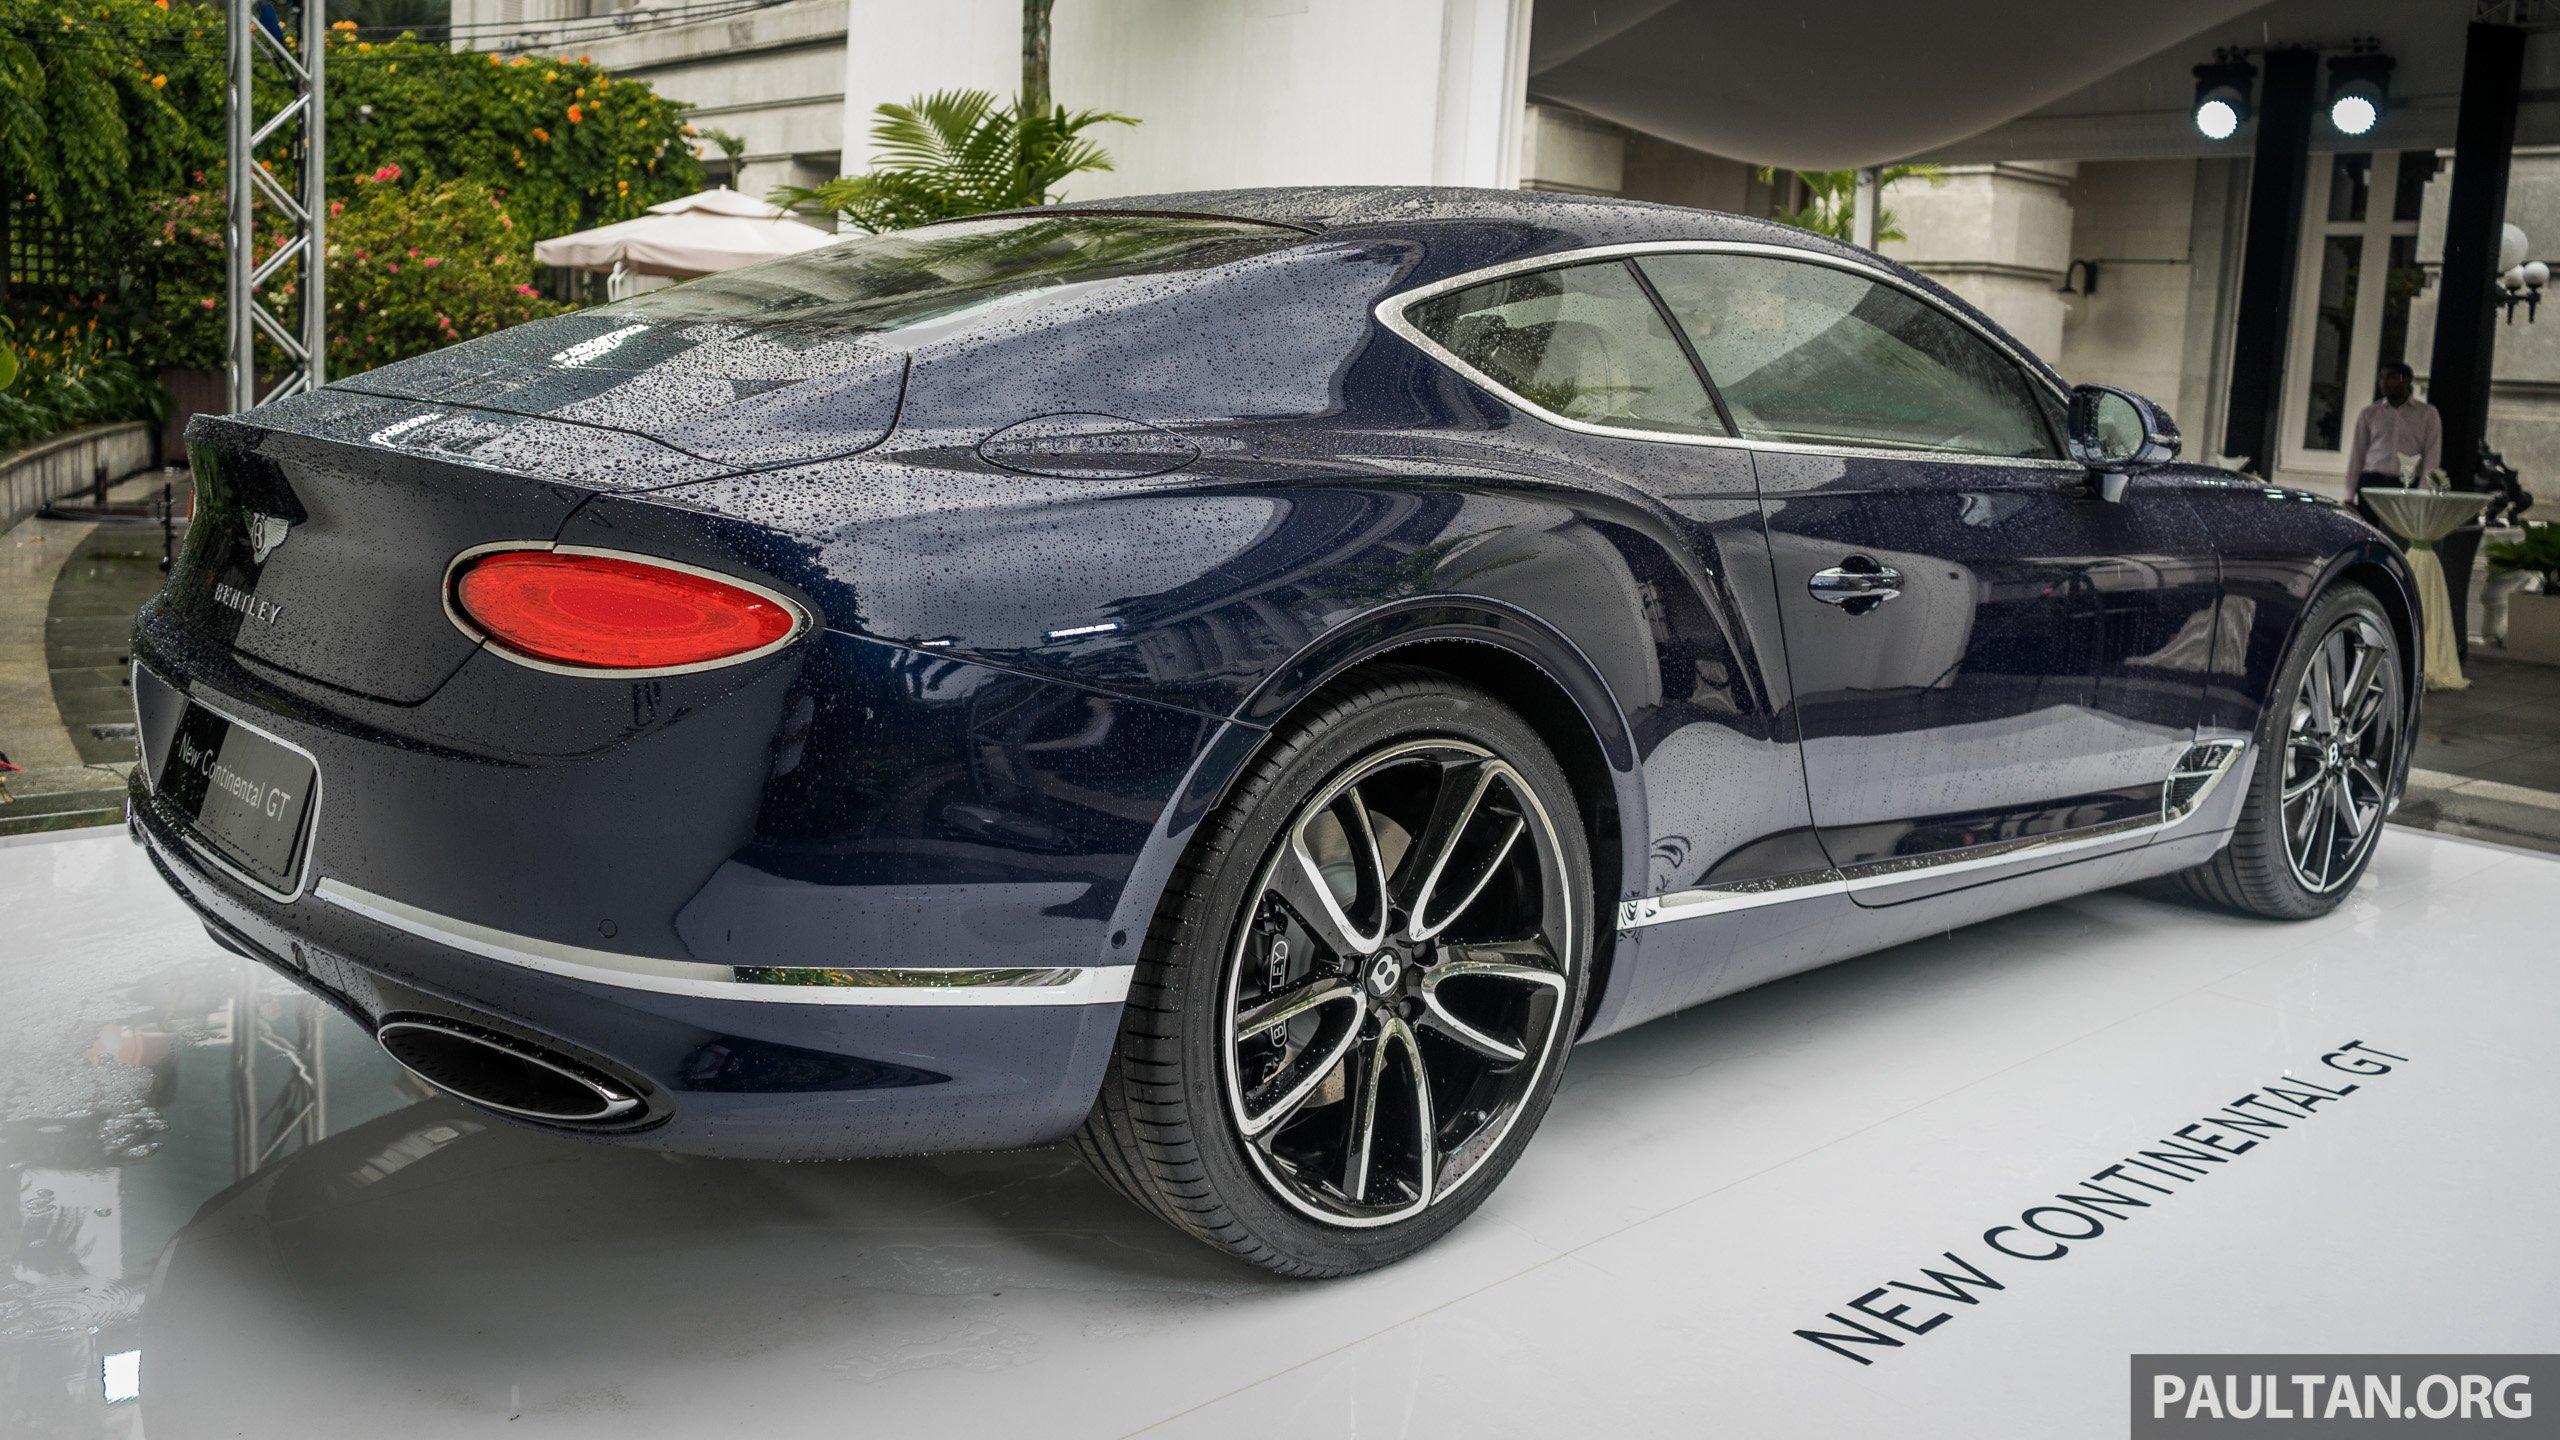 Bentley Continental Gt Price New | Autos Post